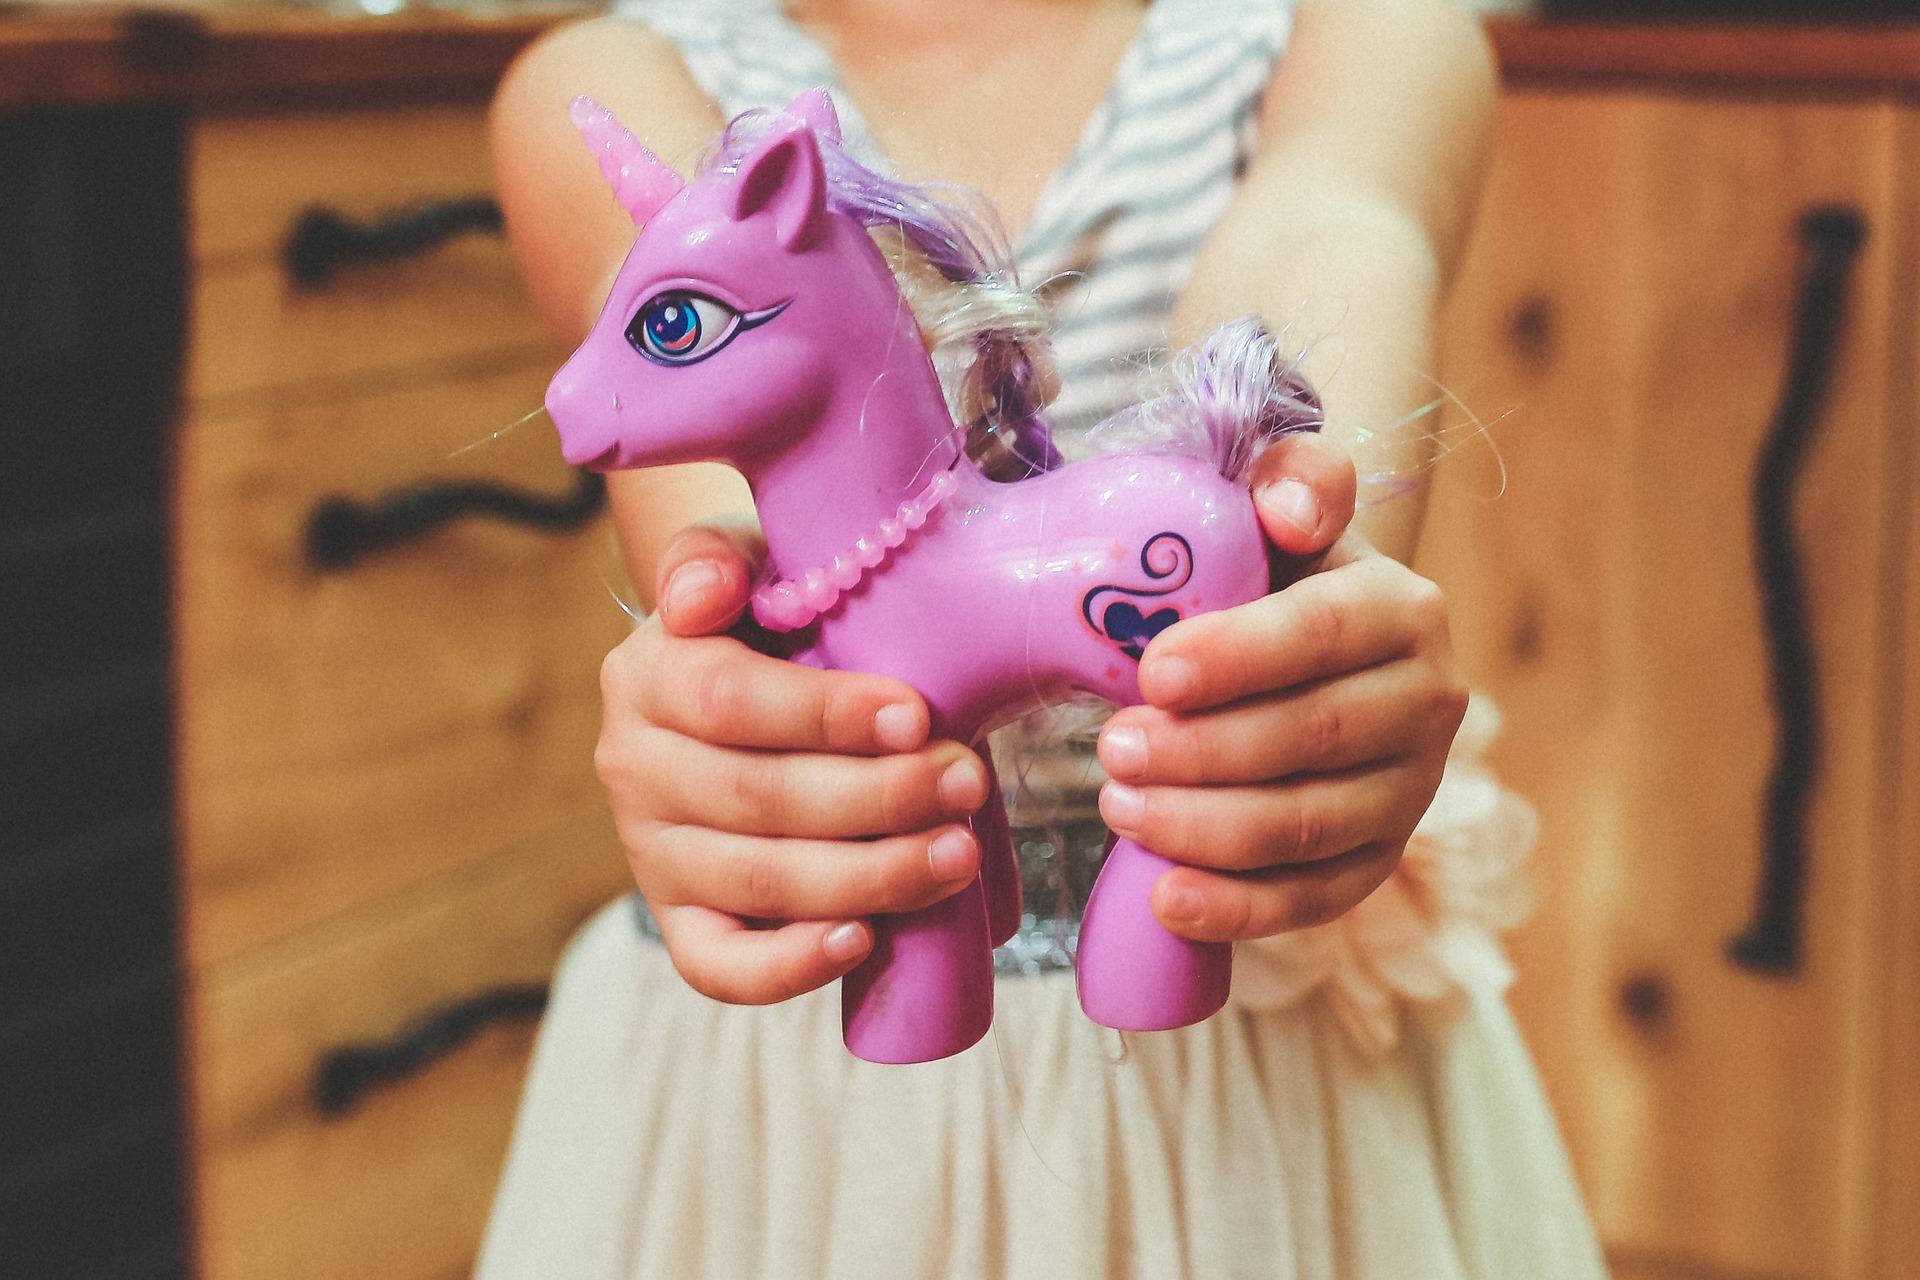 toy-791265_1920.jpg